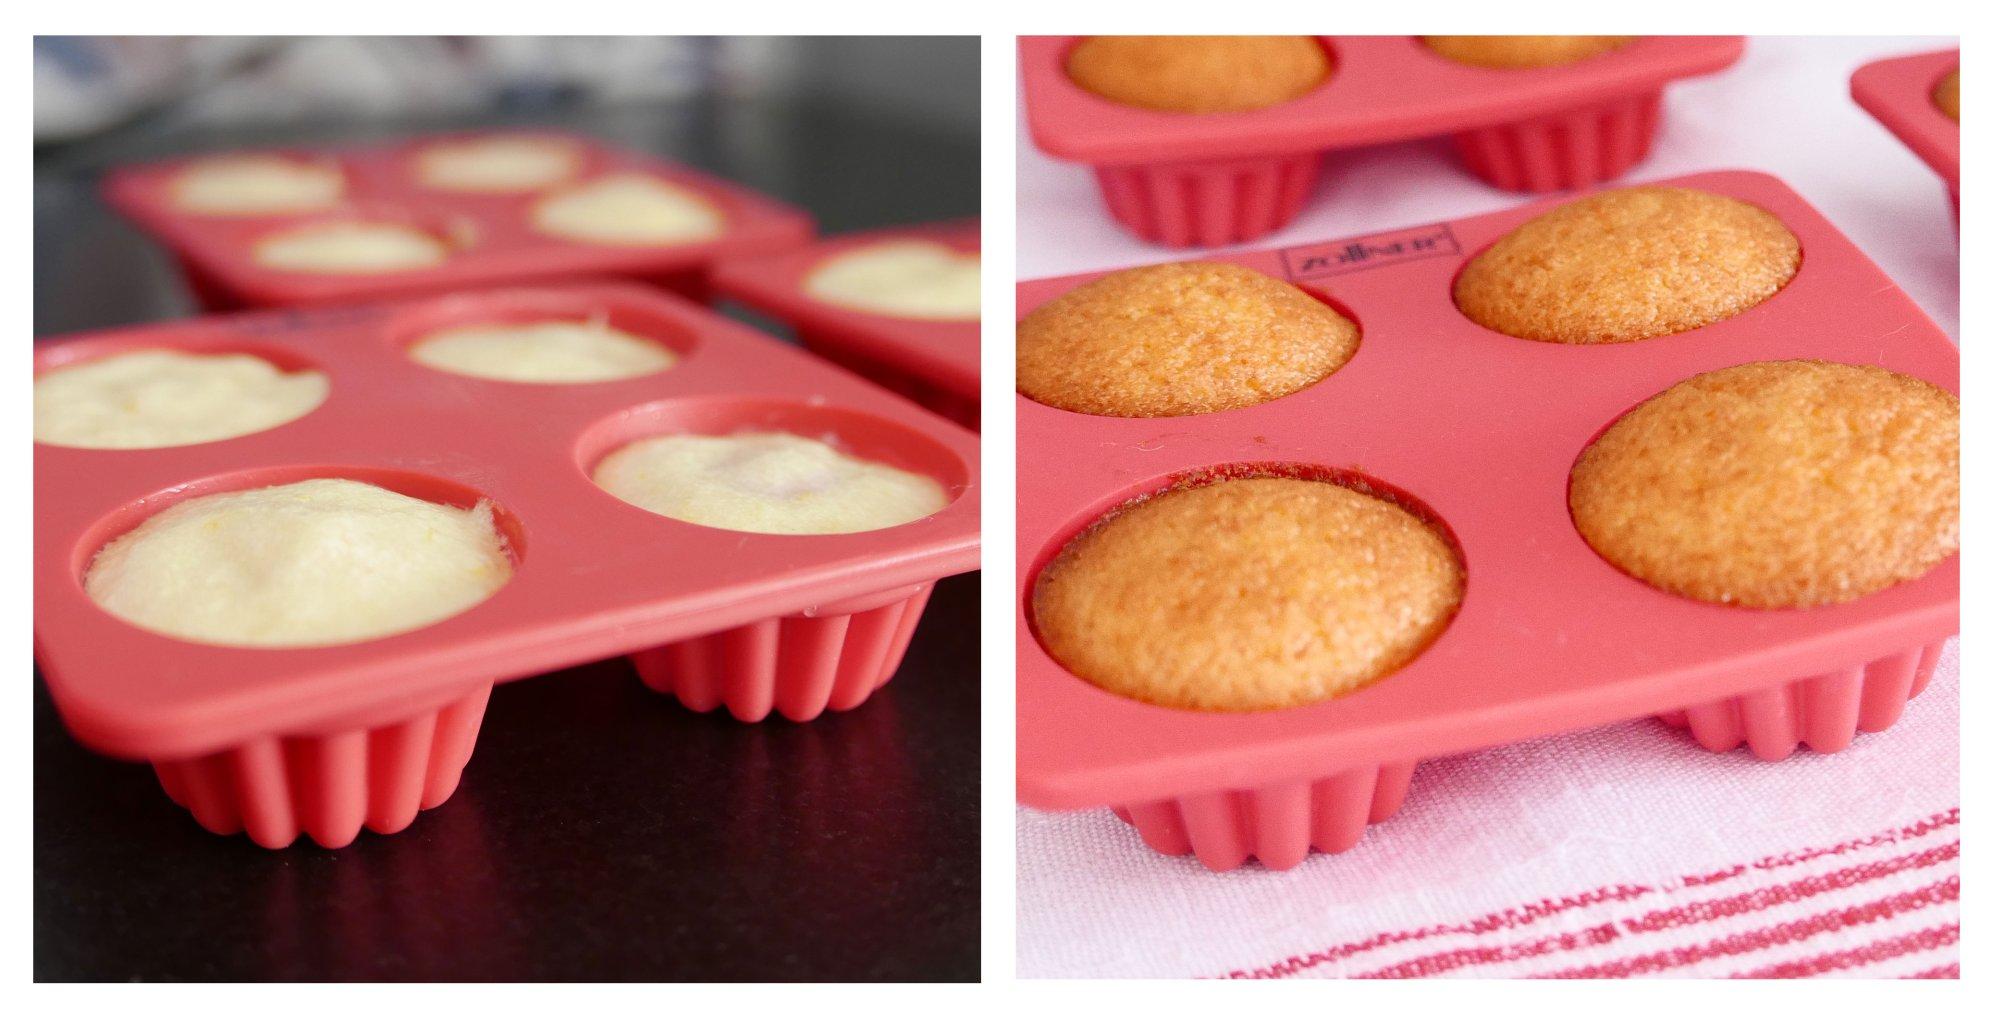 Gugelhupfform aus Silikon (3er-Set), für je 4 Muffins